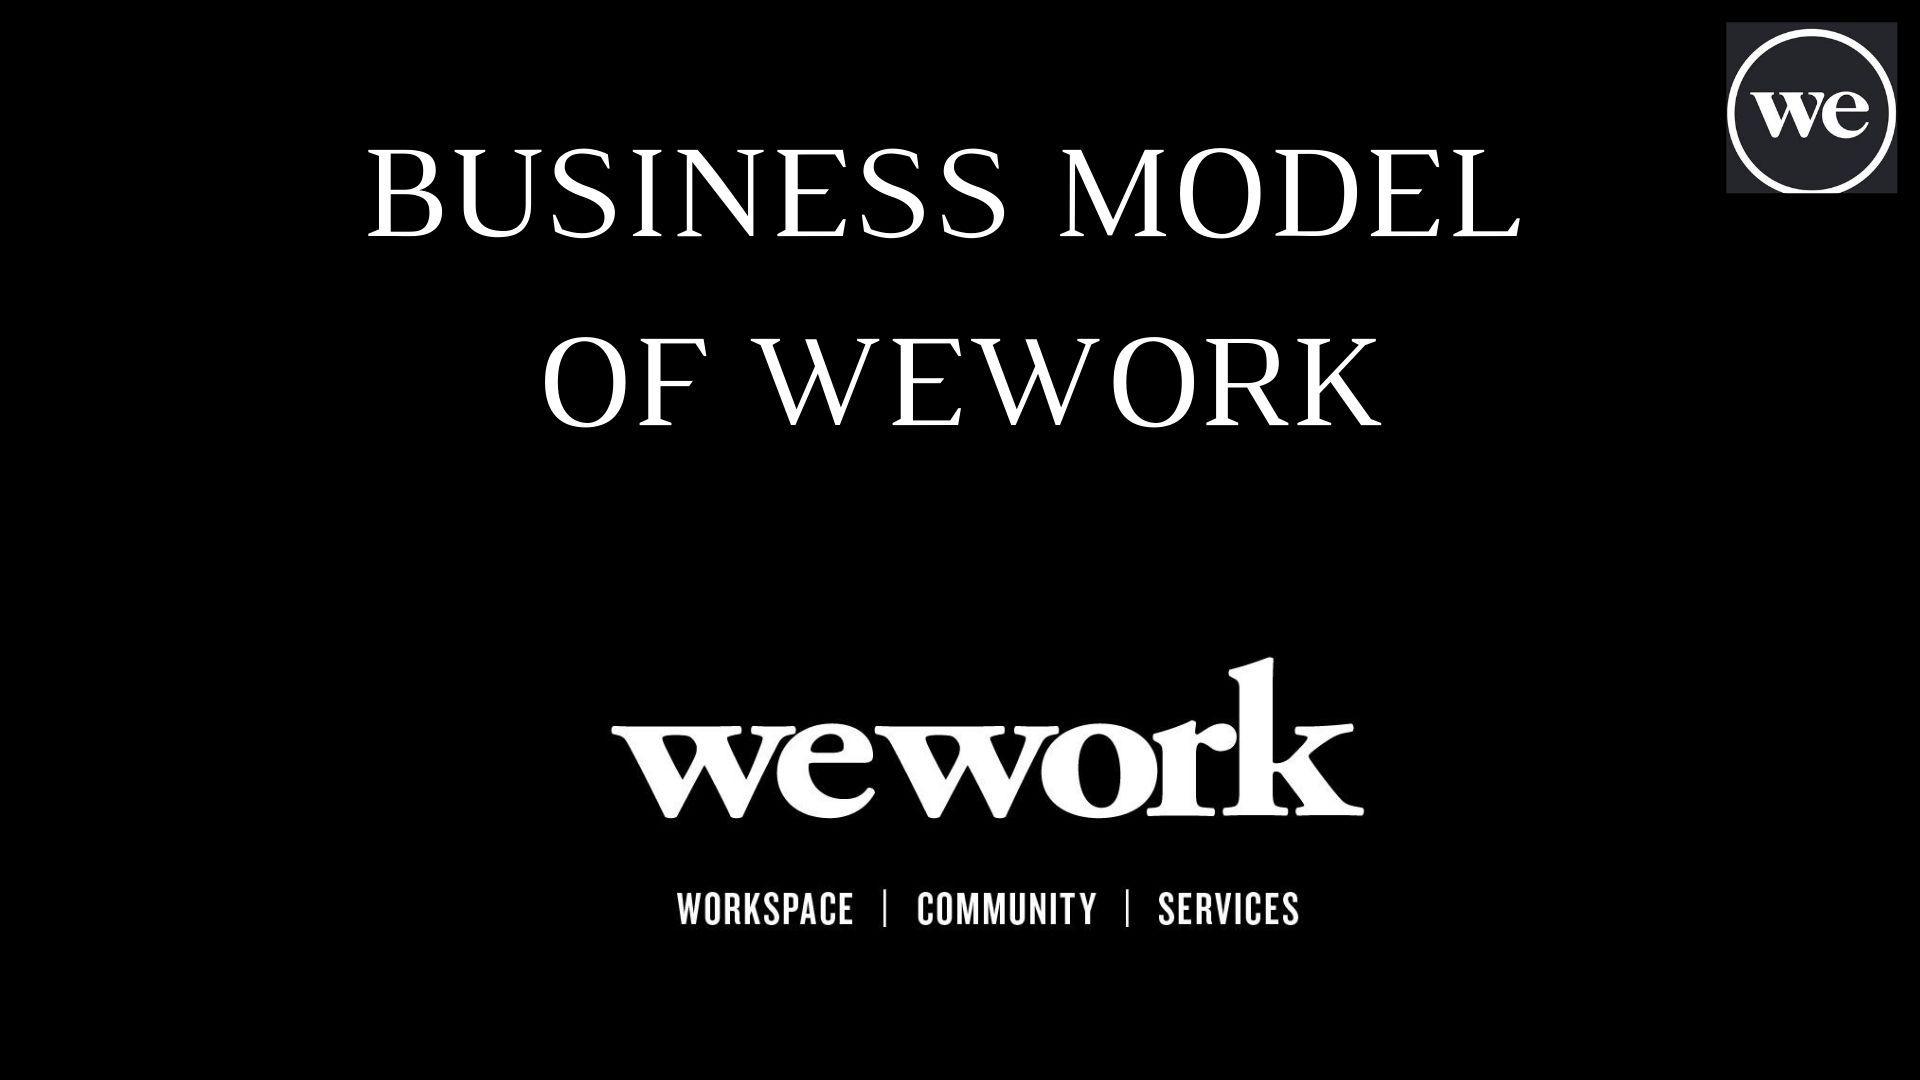 Business model of Wework